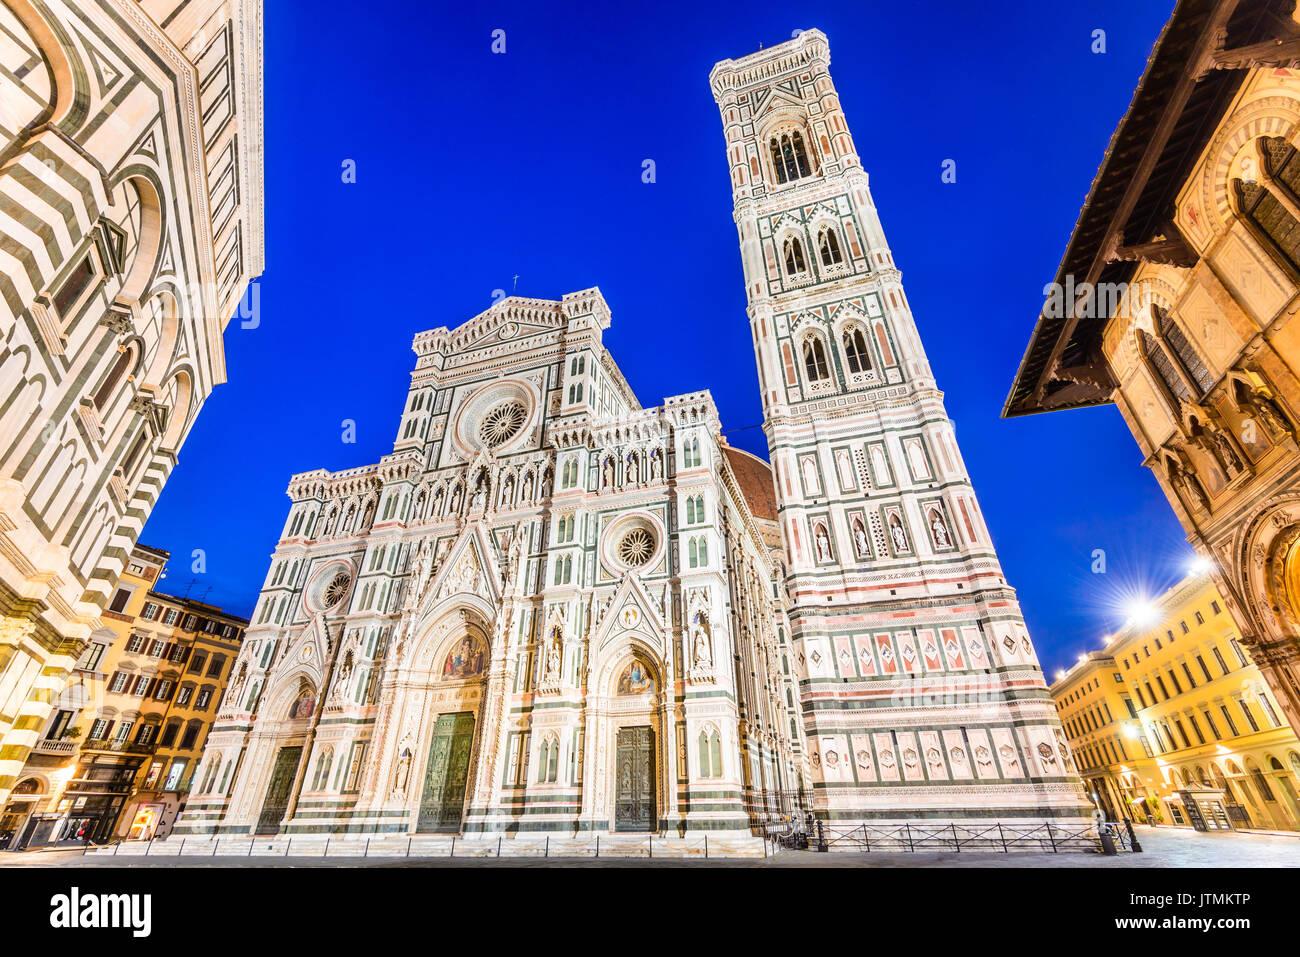 Florence, Tuscany - Night scenery with Piazza del Duomo and Catedrale Santa Maria del Fiori, Renaissance architecture in Italy. - Stock Image